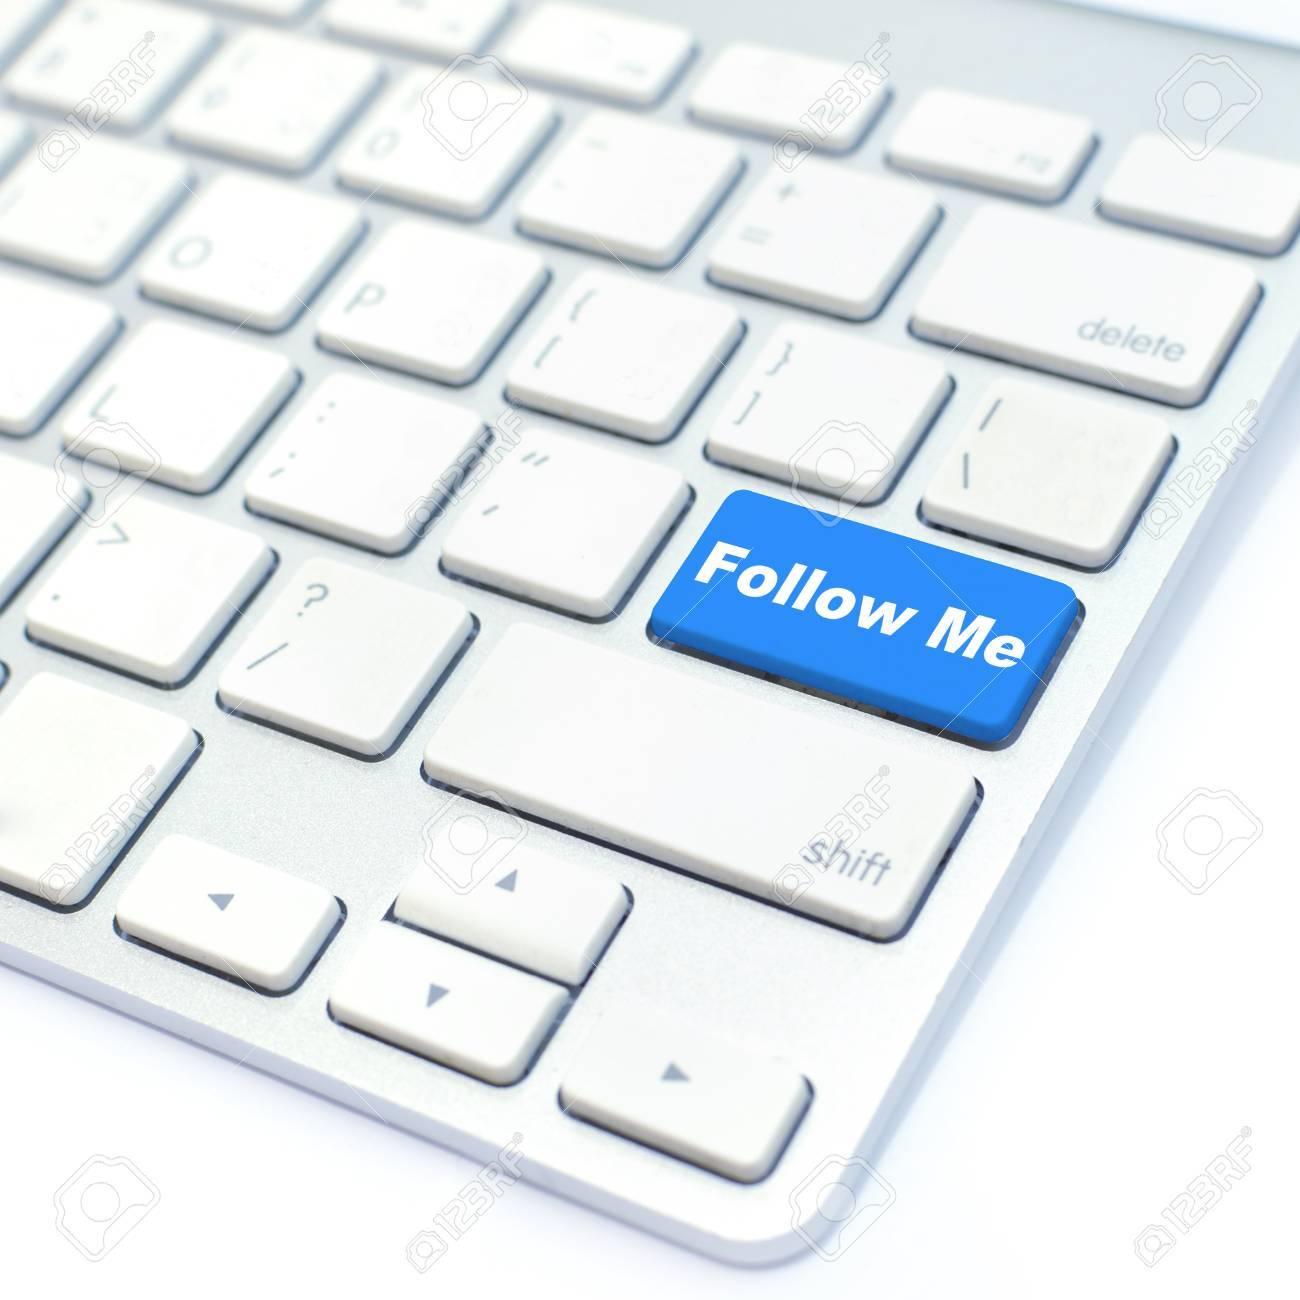 follow me button Stock Photo - 12927467